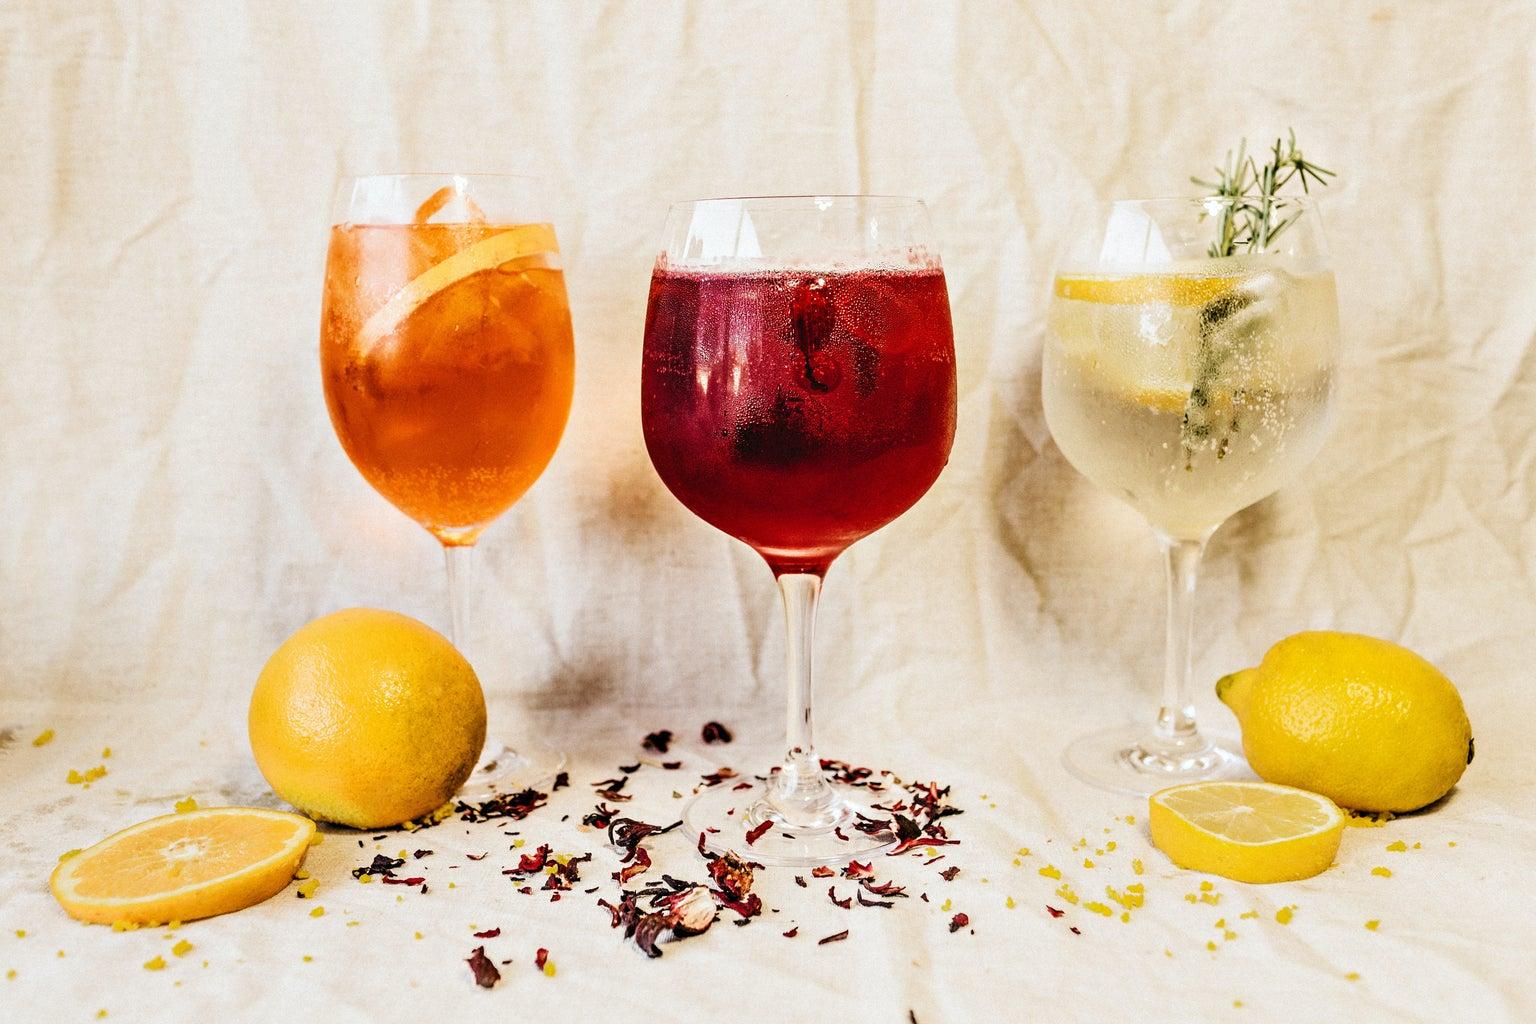 Three glasses of gin & tonic